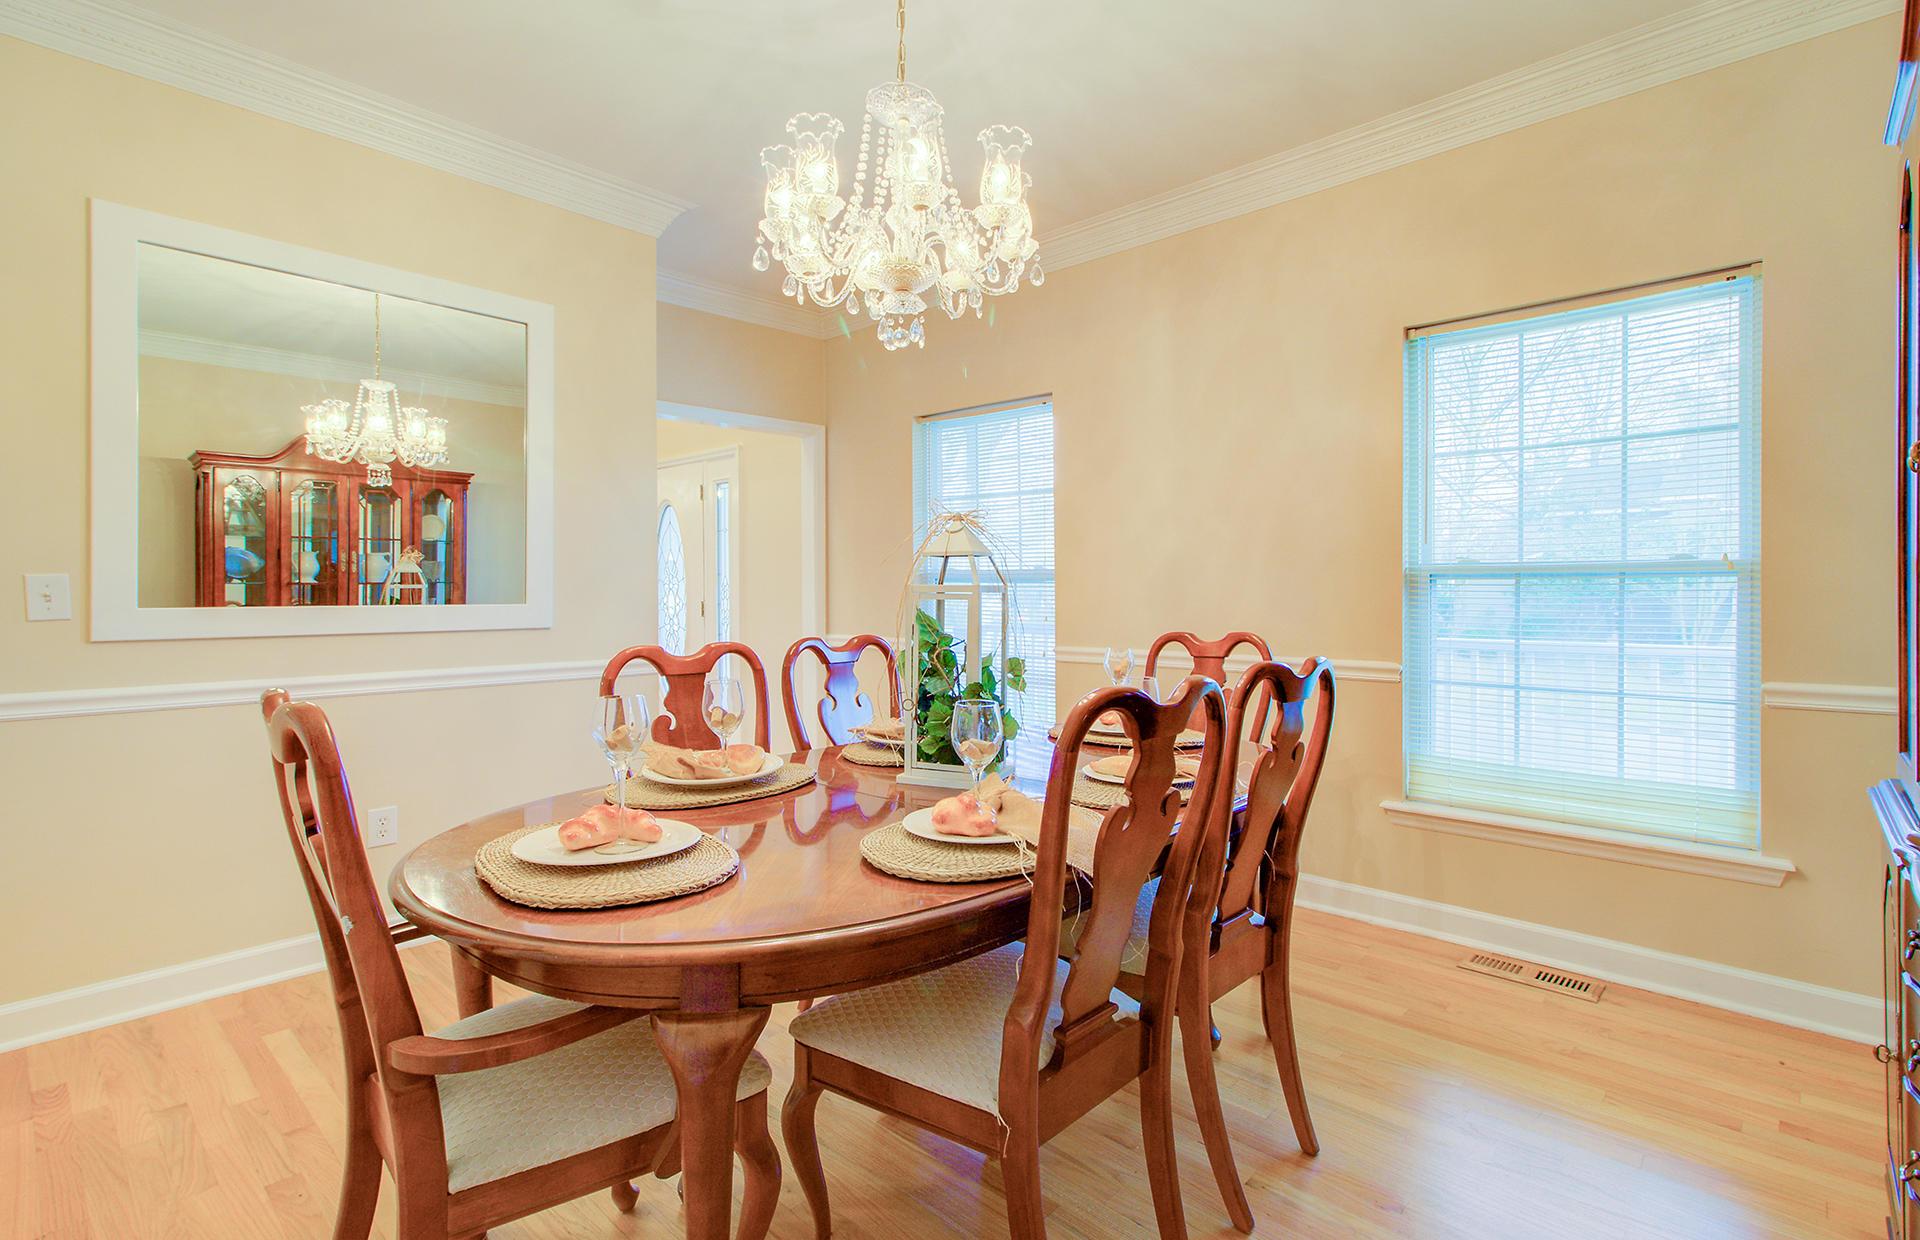 Bakers Landing Homes For Sale - 105 River Oak, North Charleston, SC - 22